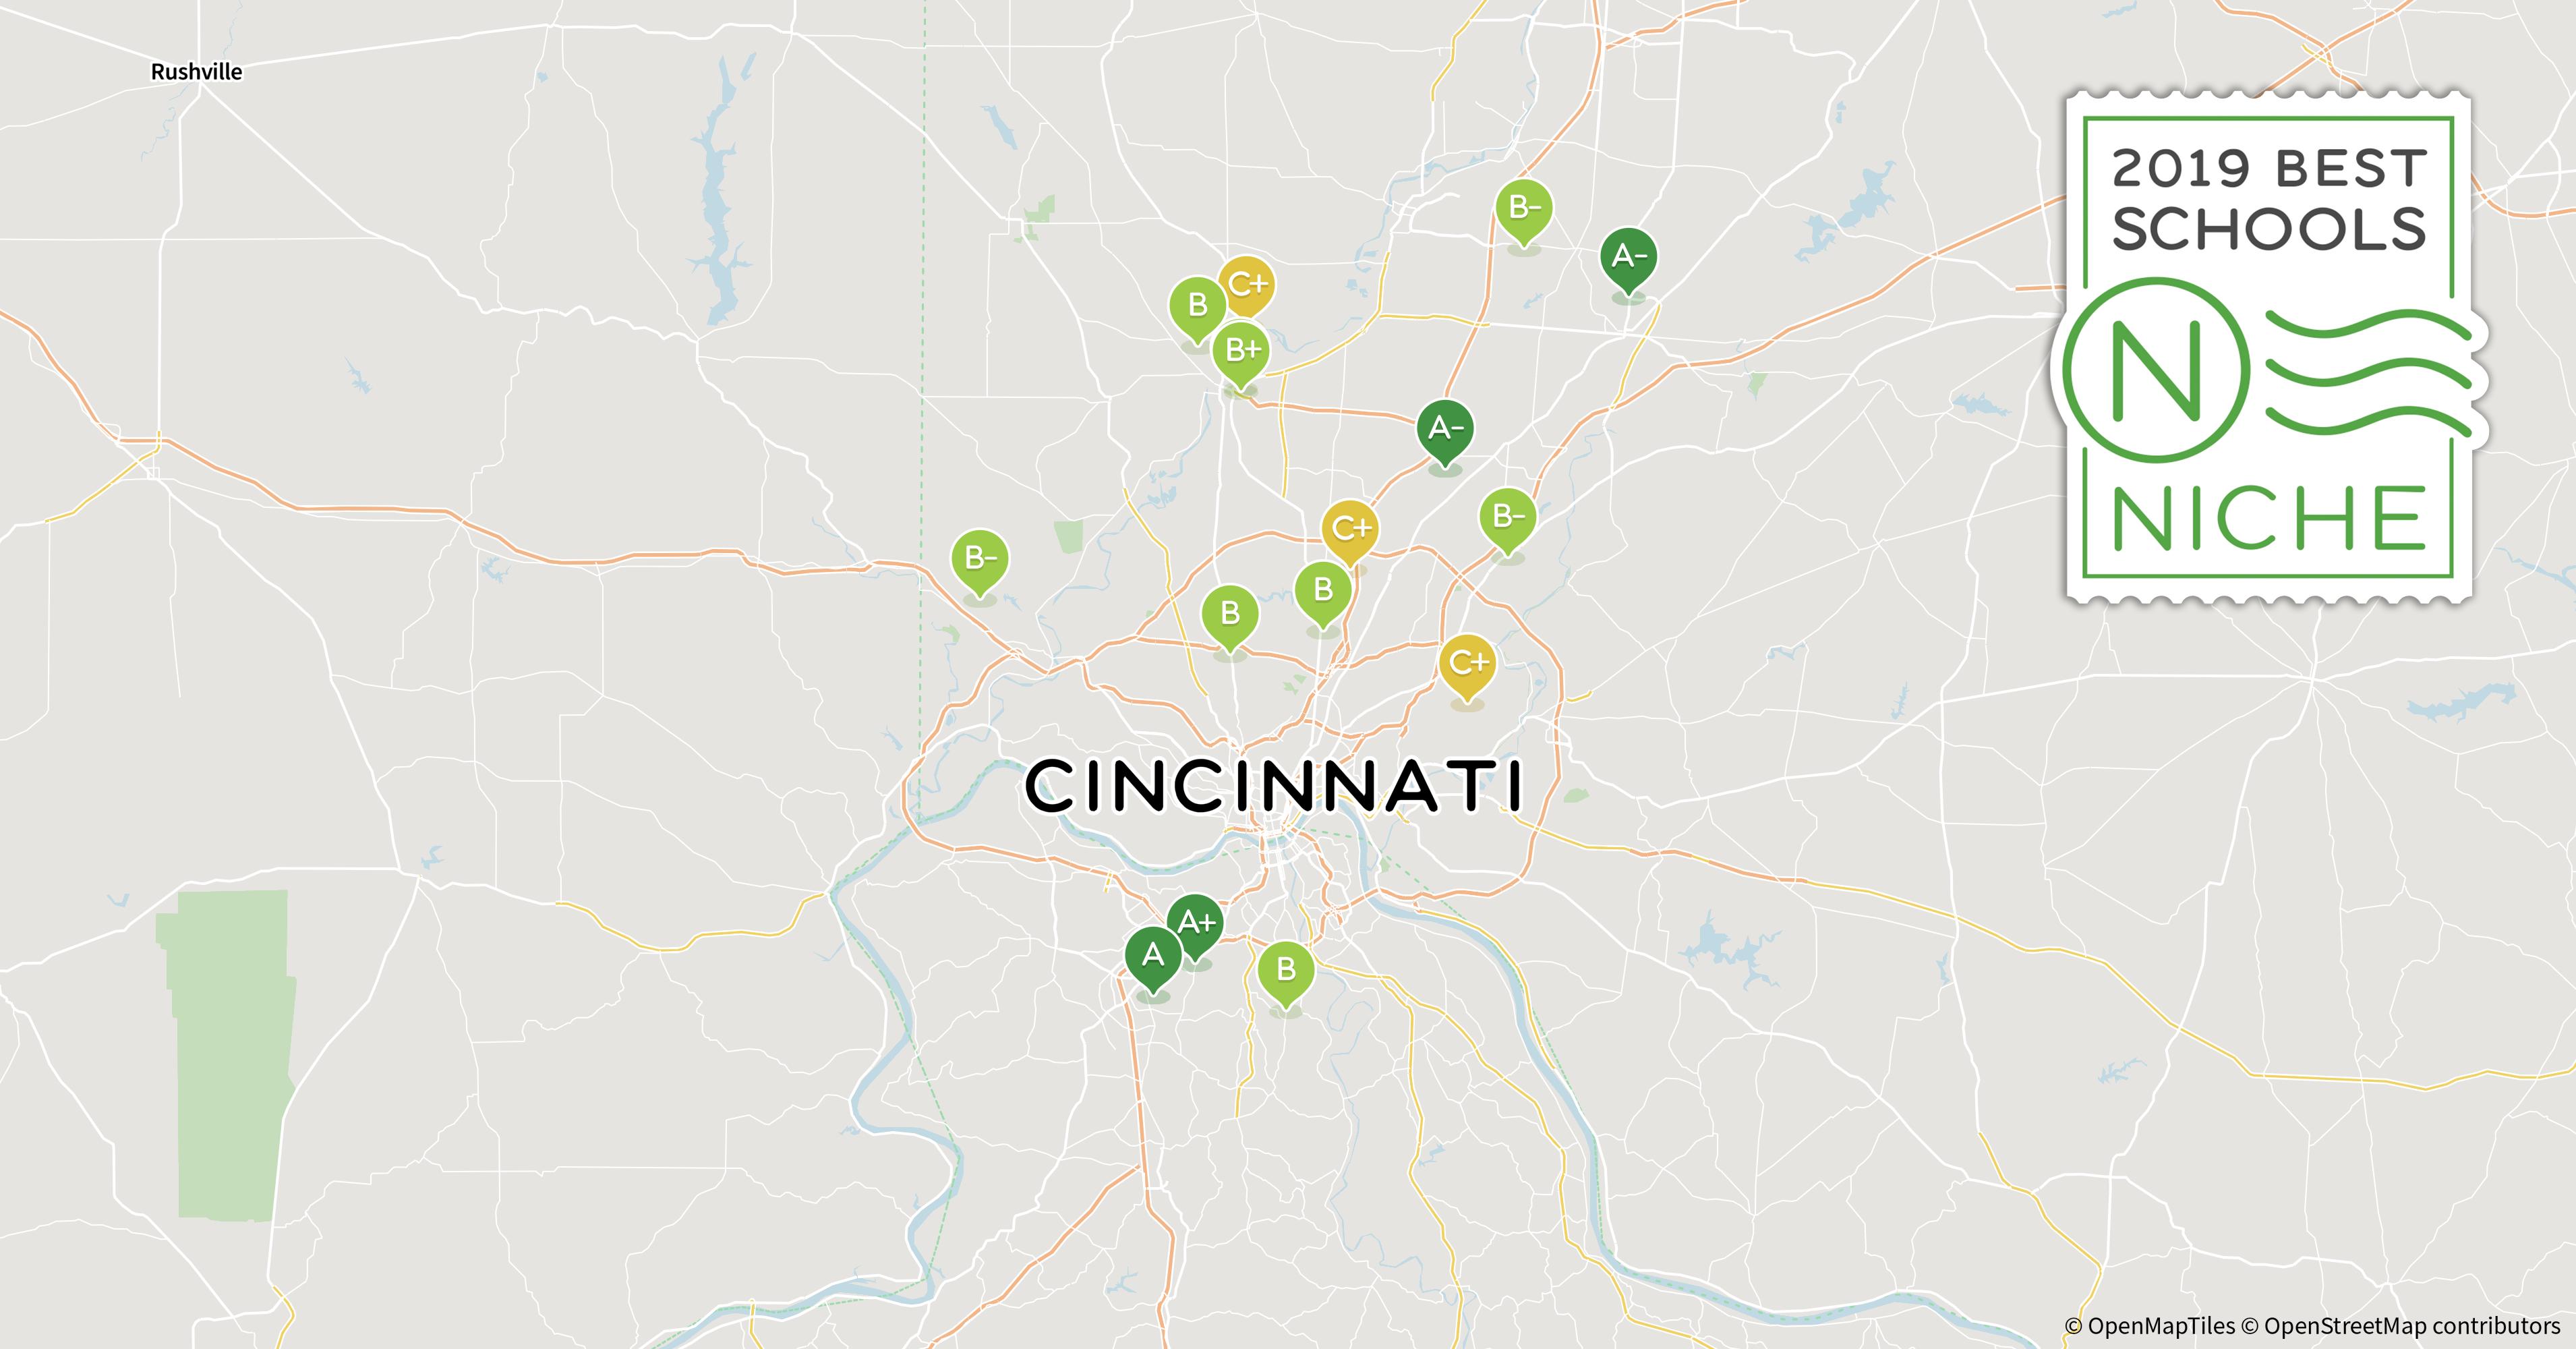 2019 Best School Districts in the Cincinnati Area - Niche